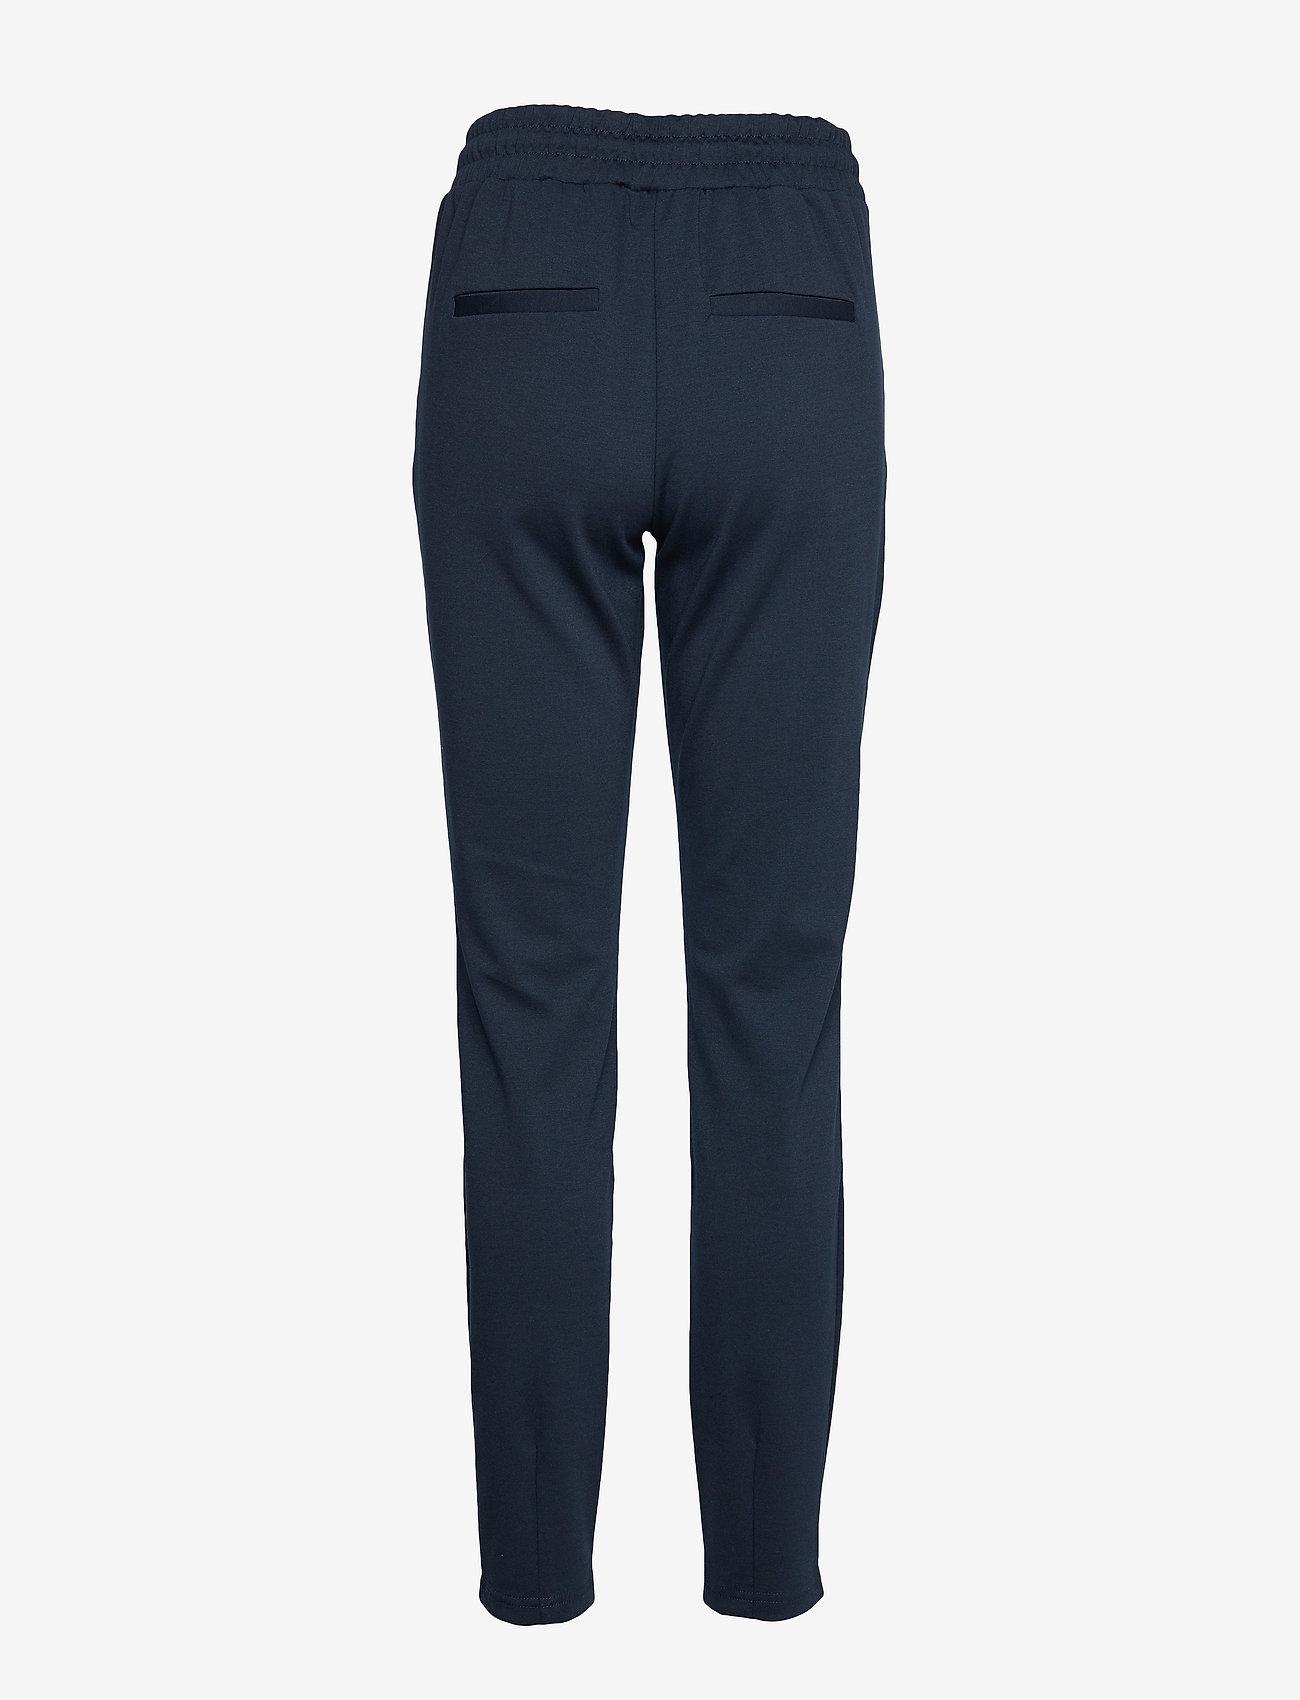 b.young - Rizetta pants 2 - Jersey - slim fit bukser - copenhagen night - 1